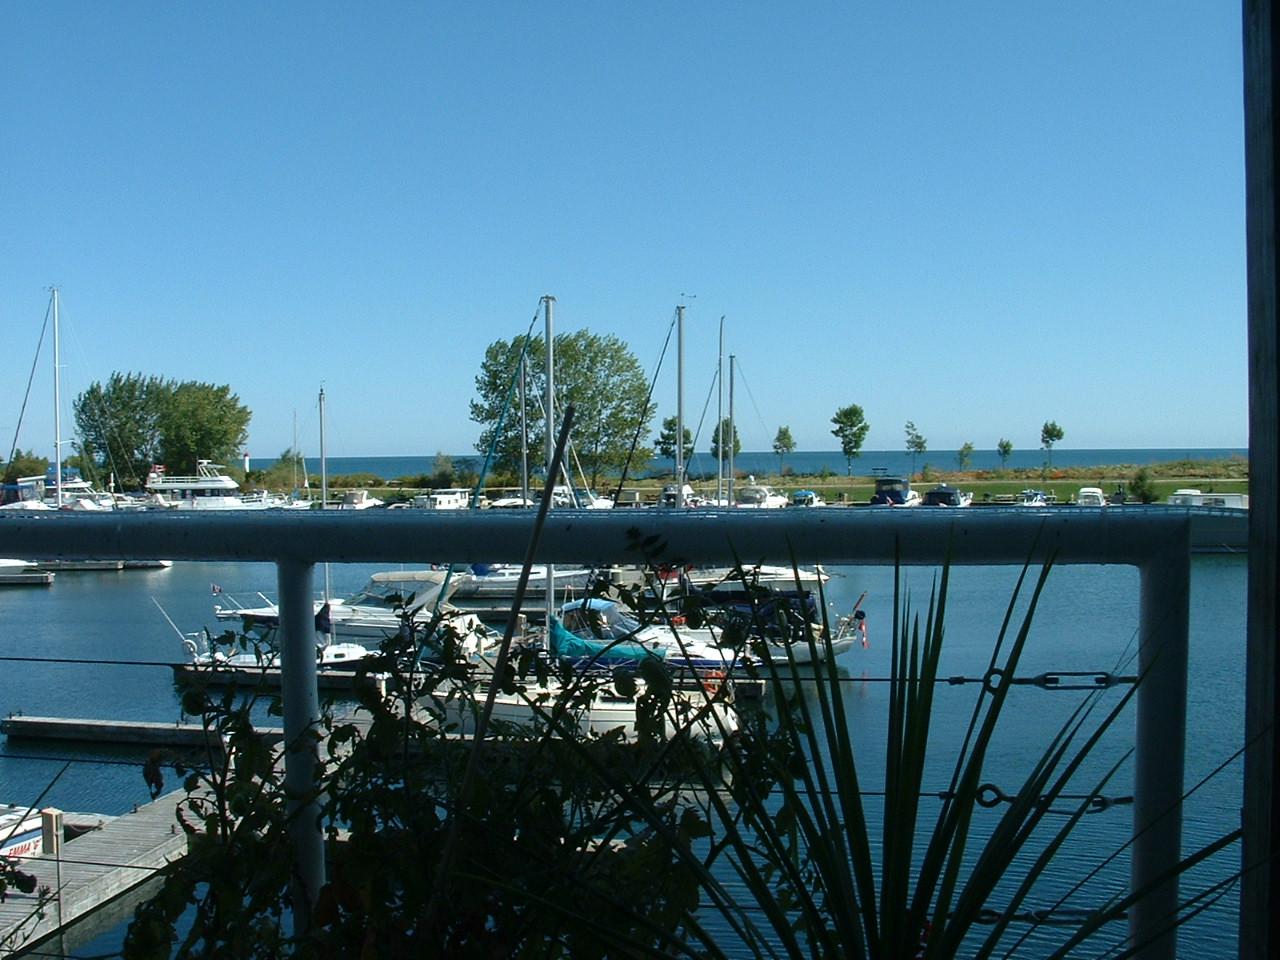 Bluffers Restaurant overlooking Lake Ontario